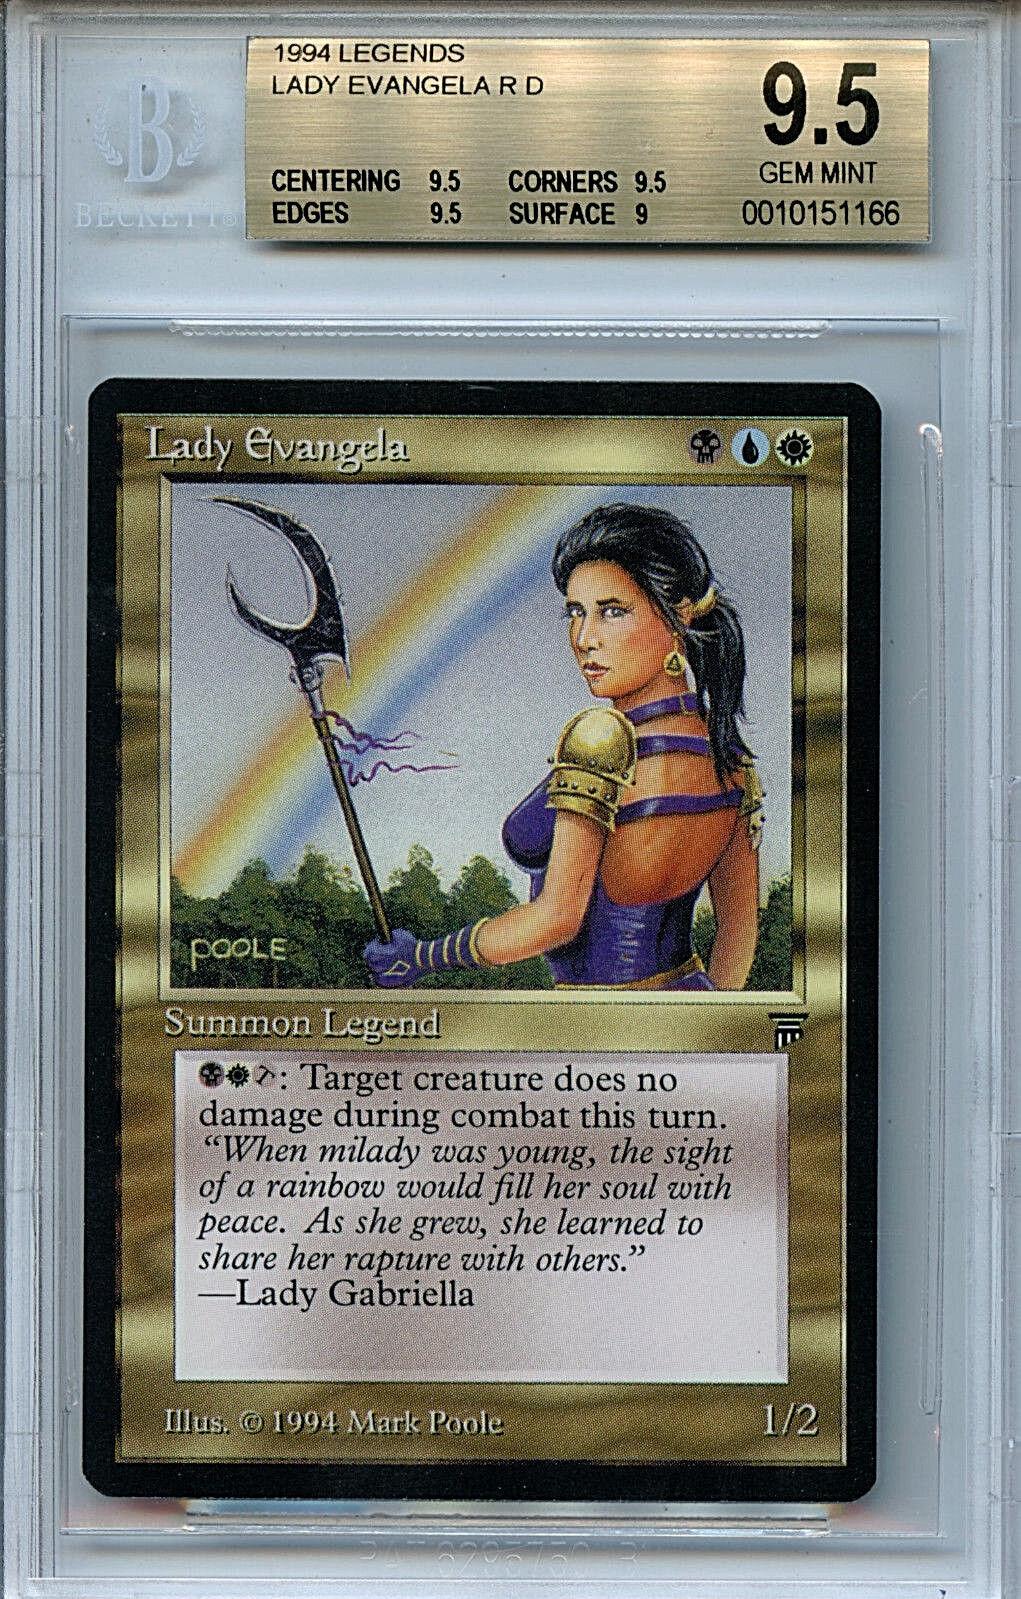 MTG Legends Lady Evangela BGS 9.5 9.5 9.5 Gem Mint card Magic the Gathering WOTC 1166 8780a1